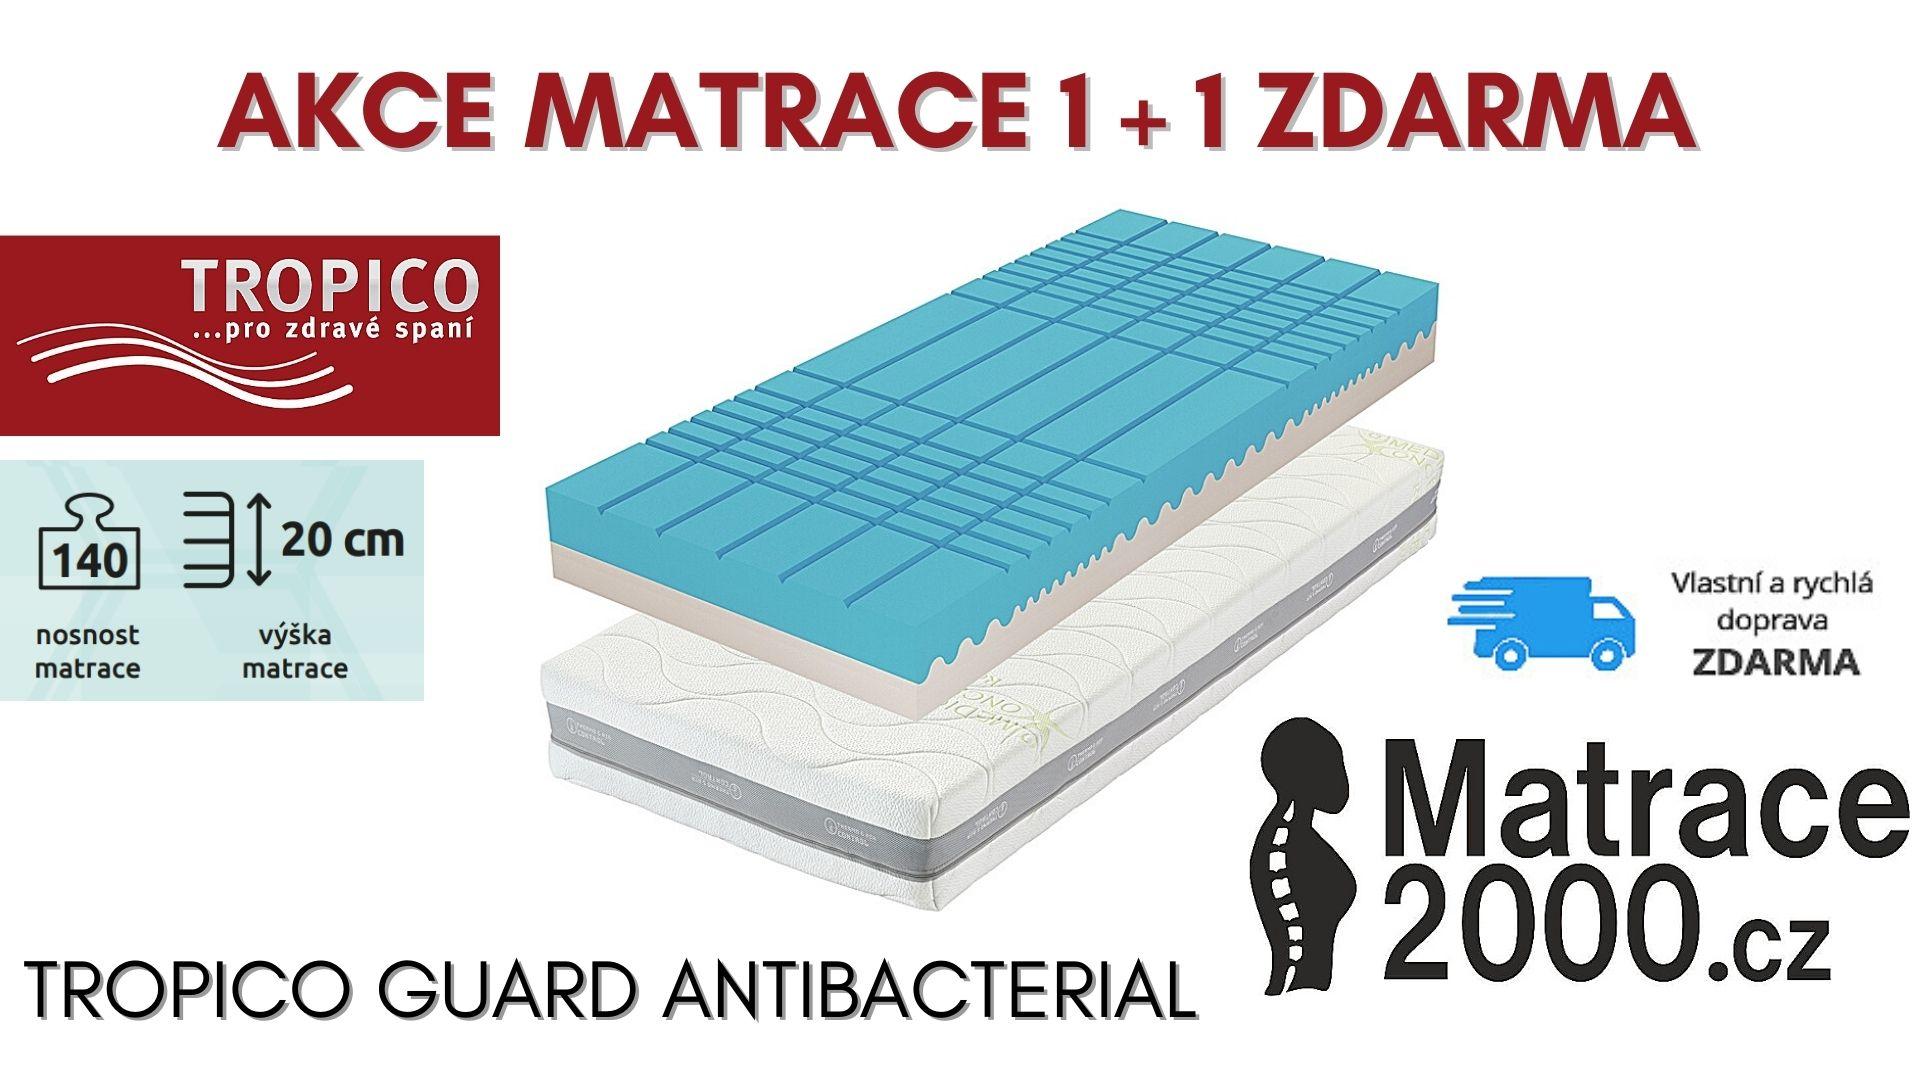 Matrace Tropico Guard Antibacterial výška 20 cm - Matrace2000.cz